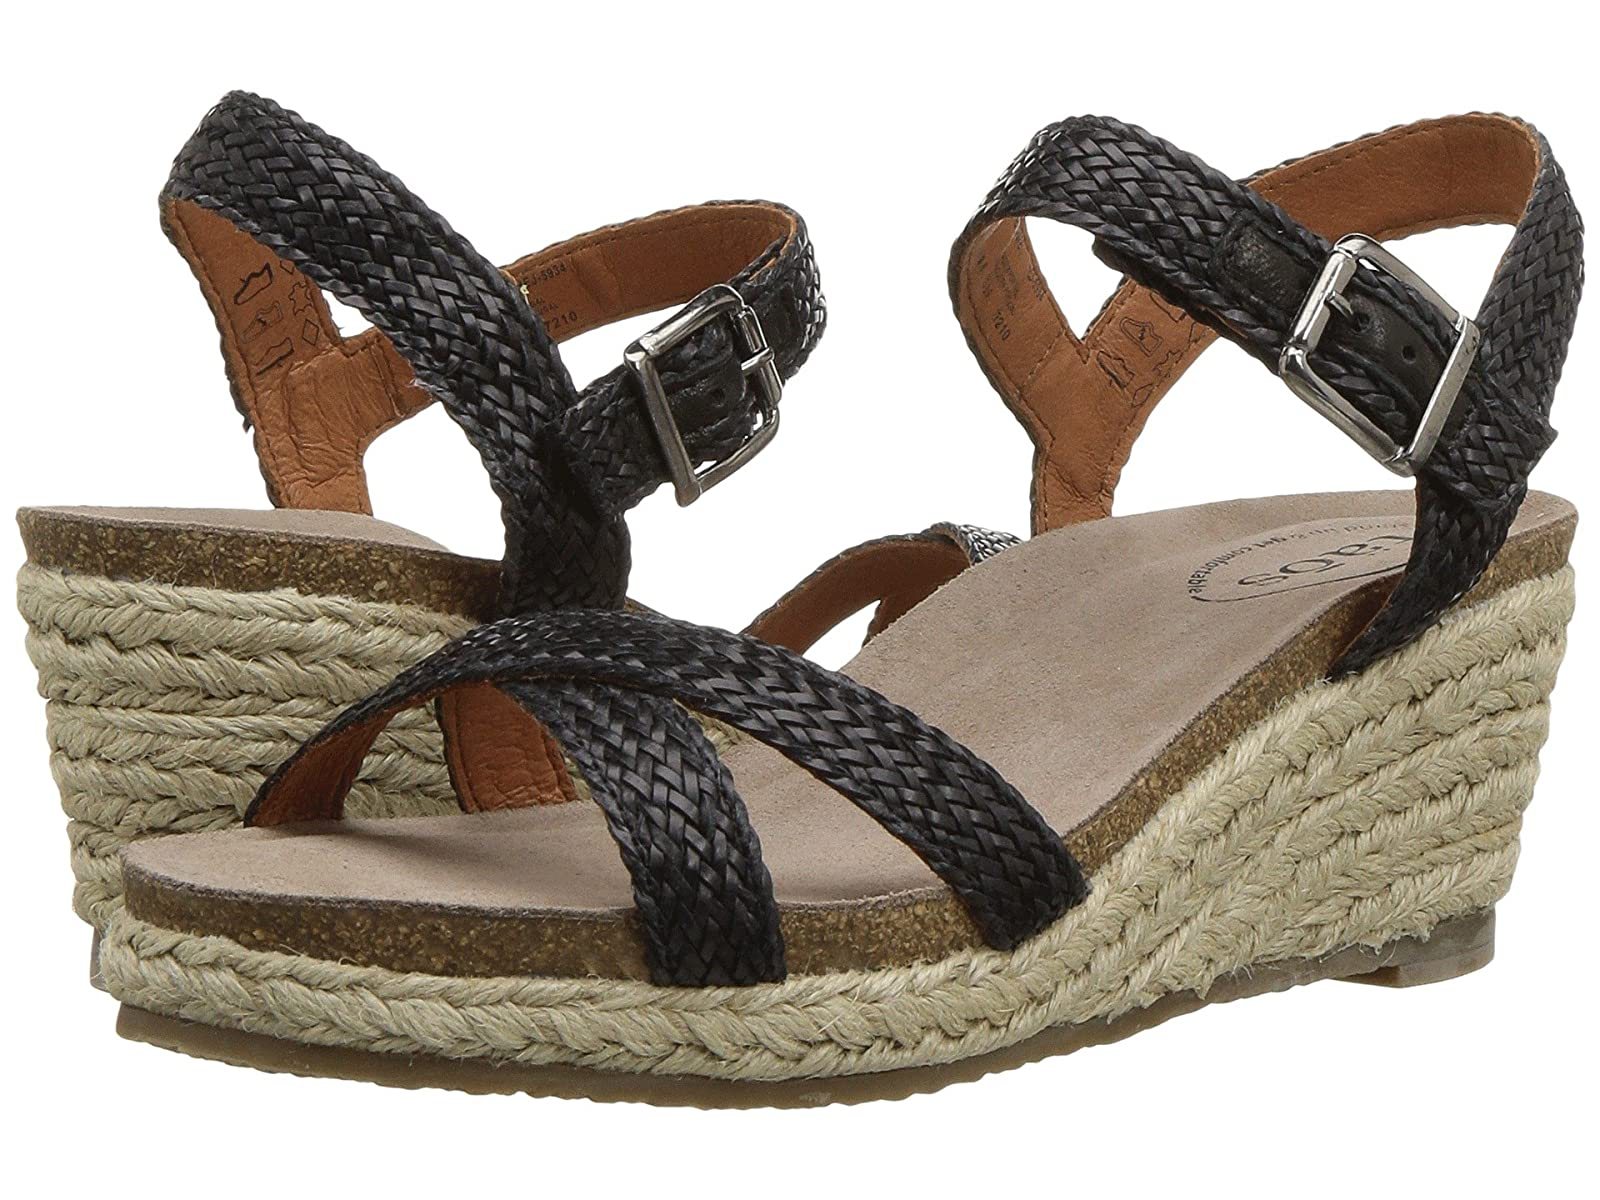 Taos Footwear Hey JuteCheap and distinctive eye-catching shoes